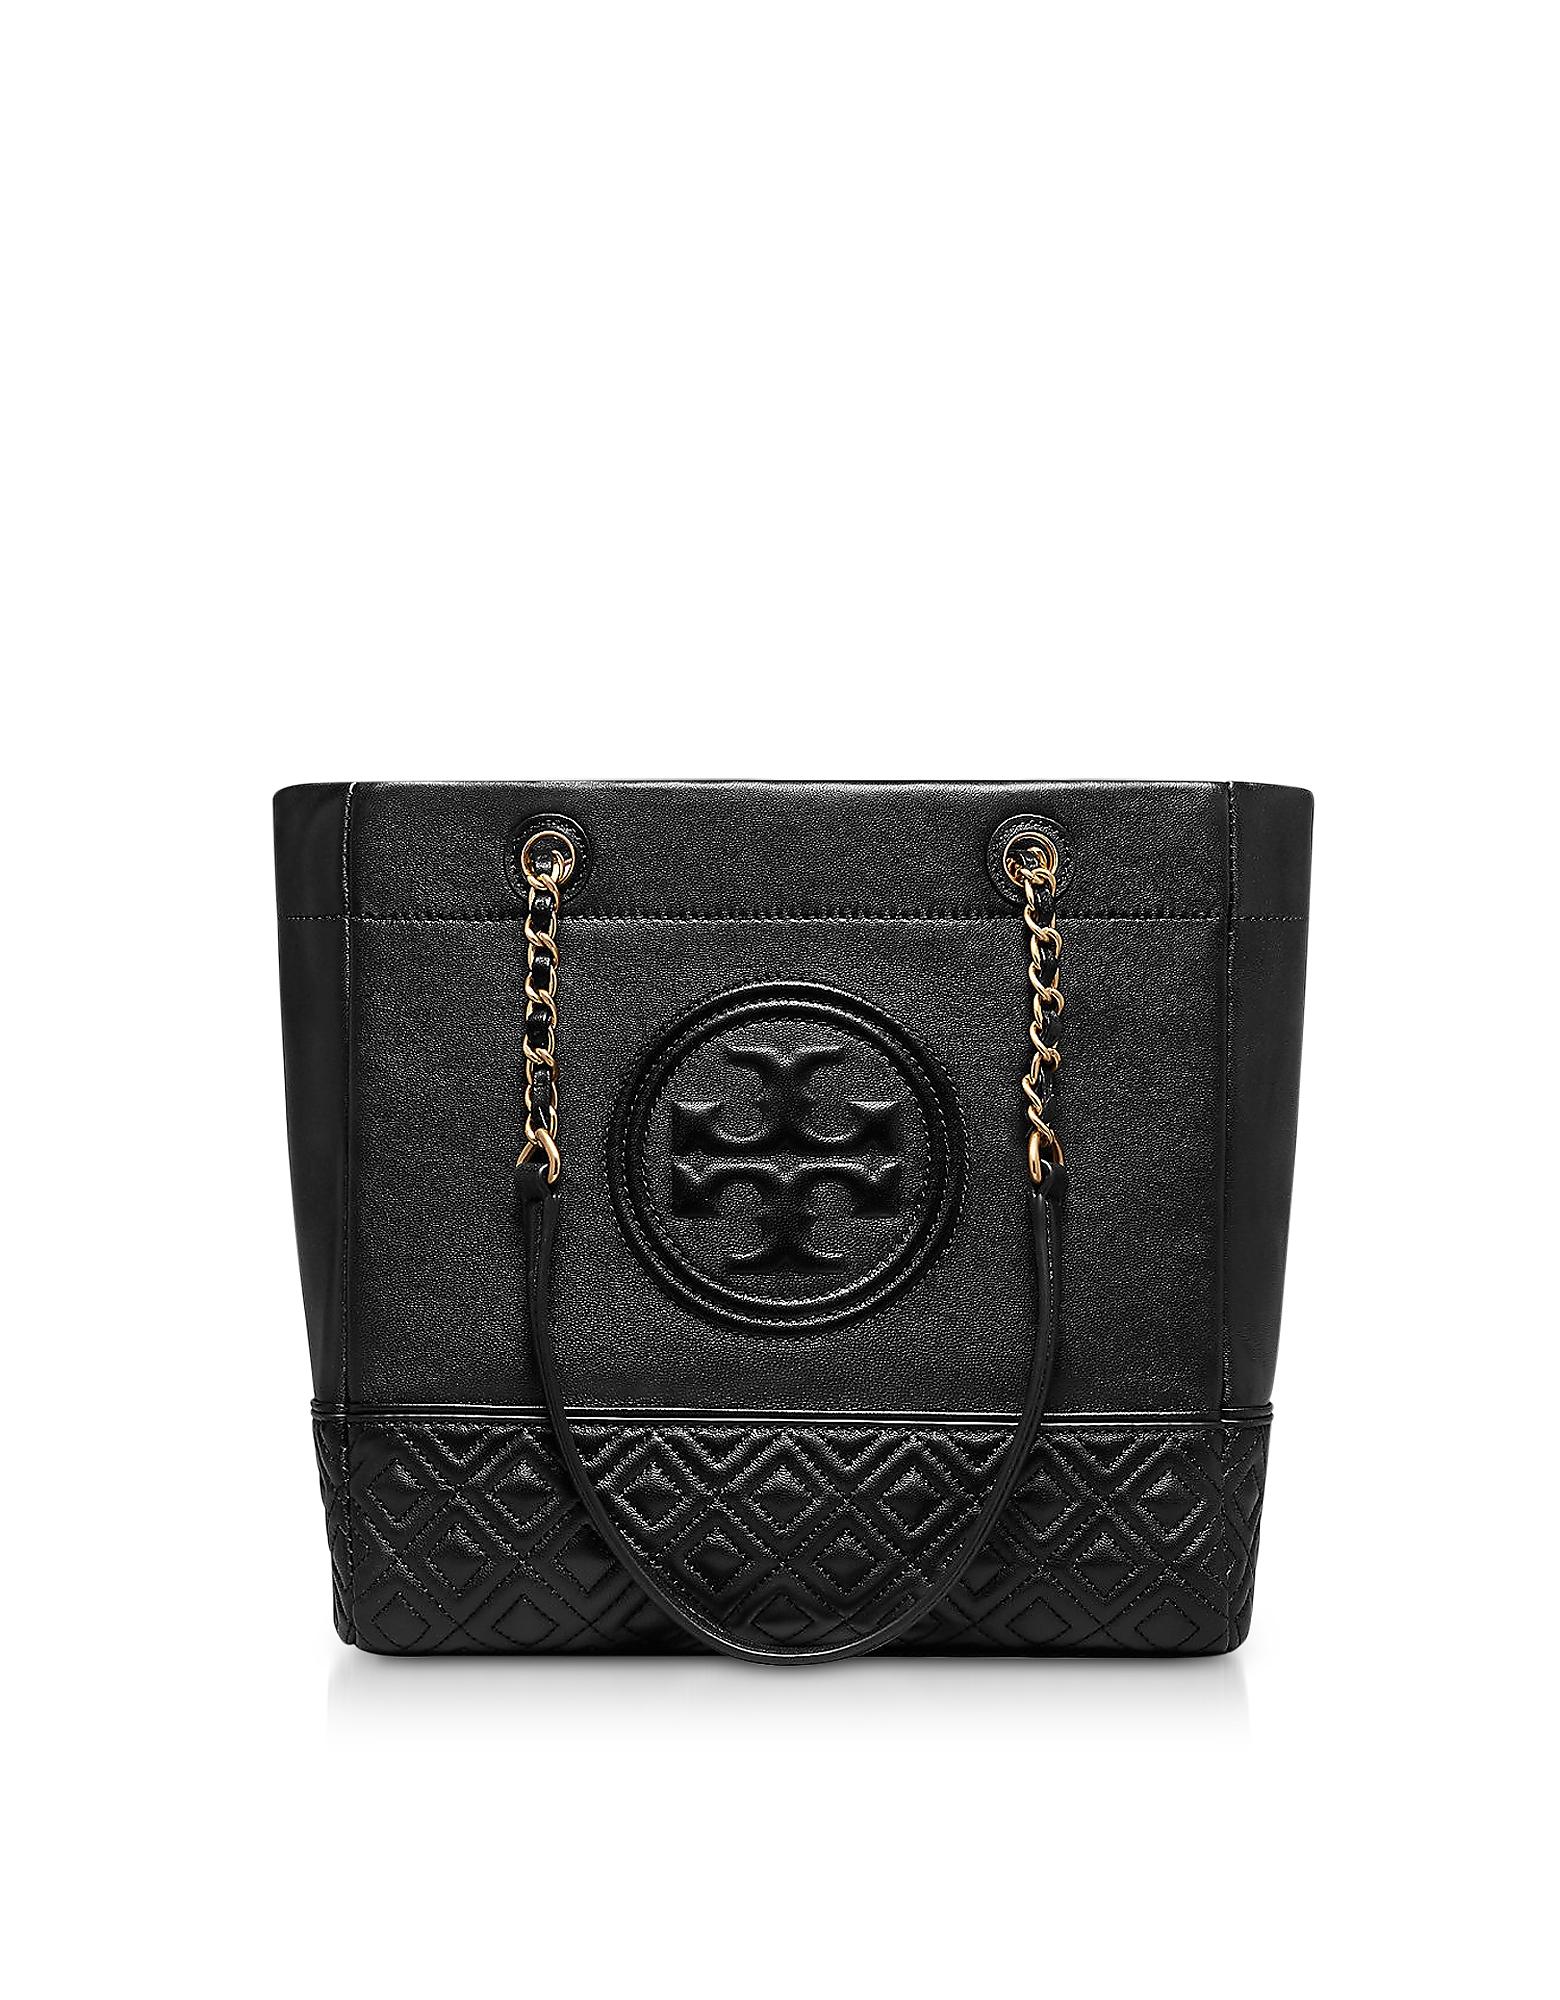 Black Leather Fleming Tote Bag